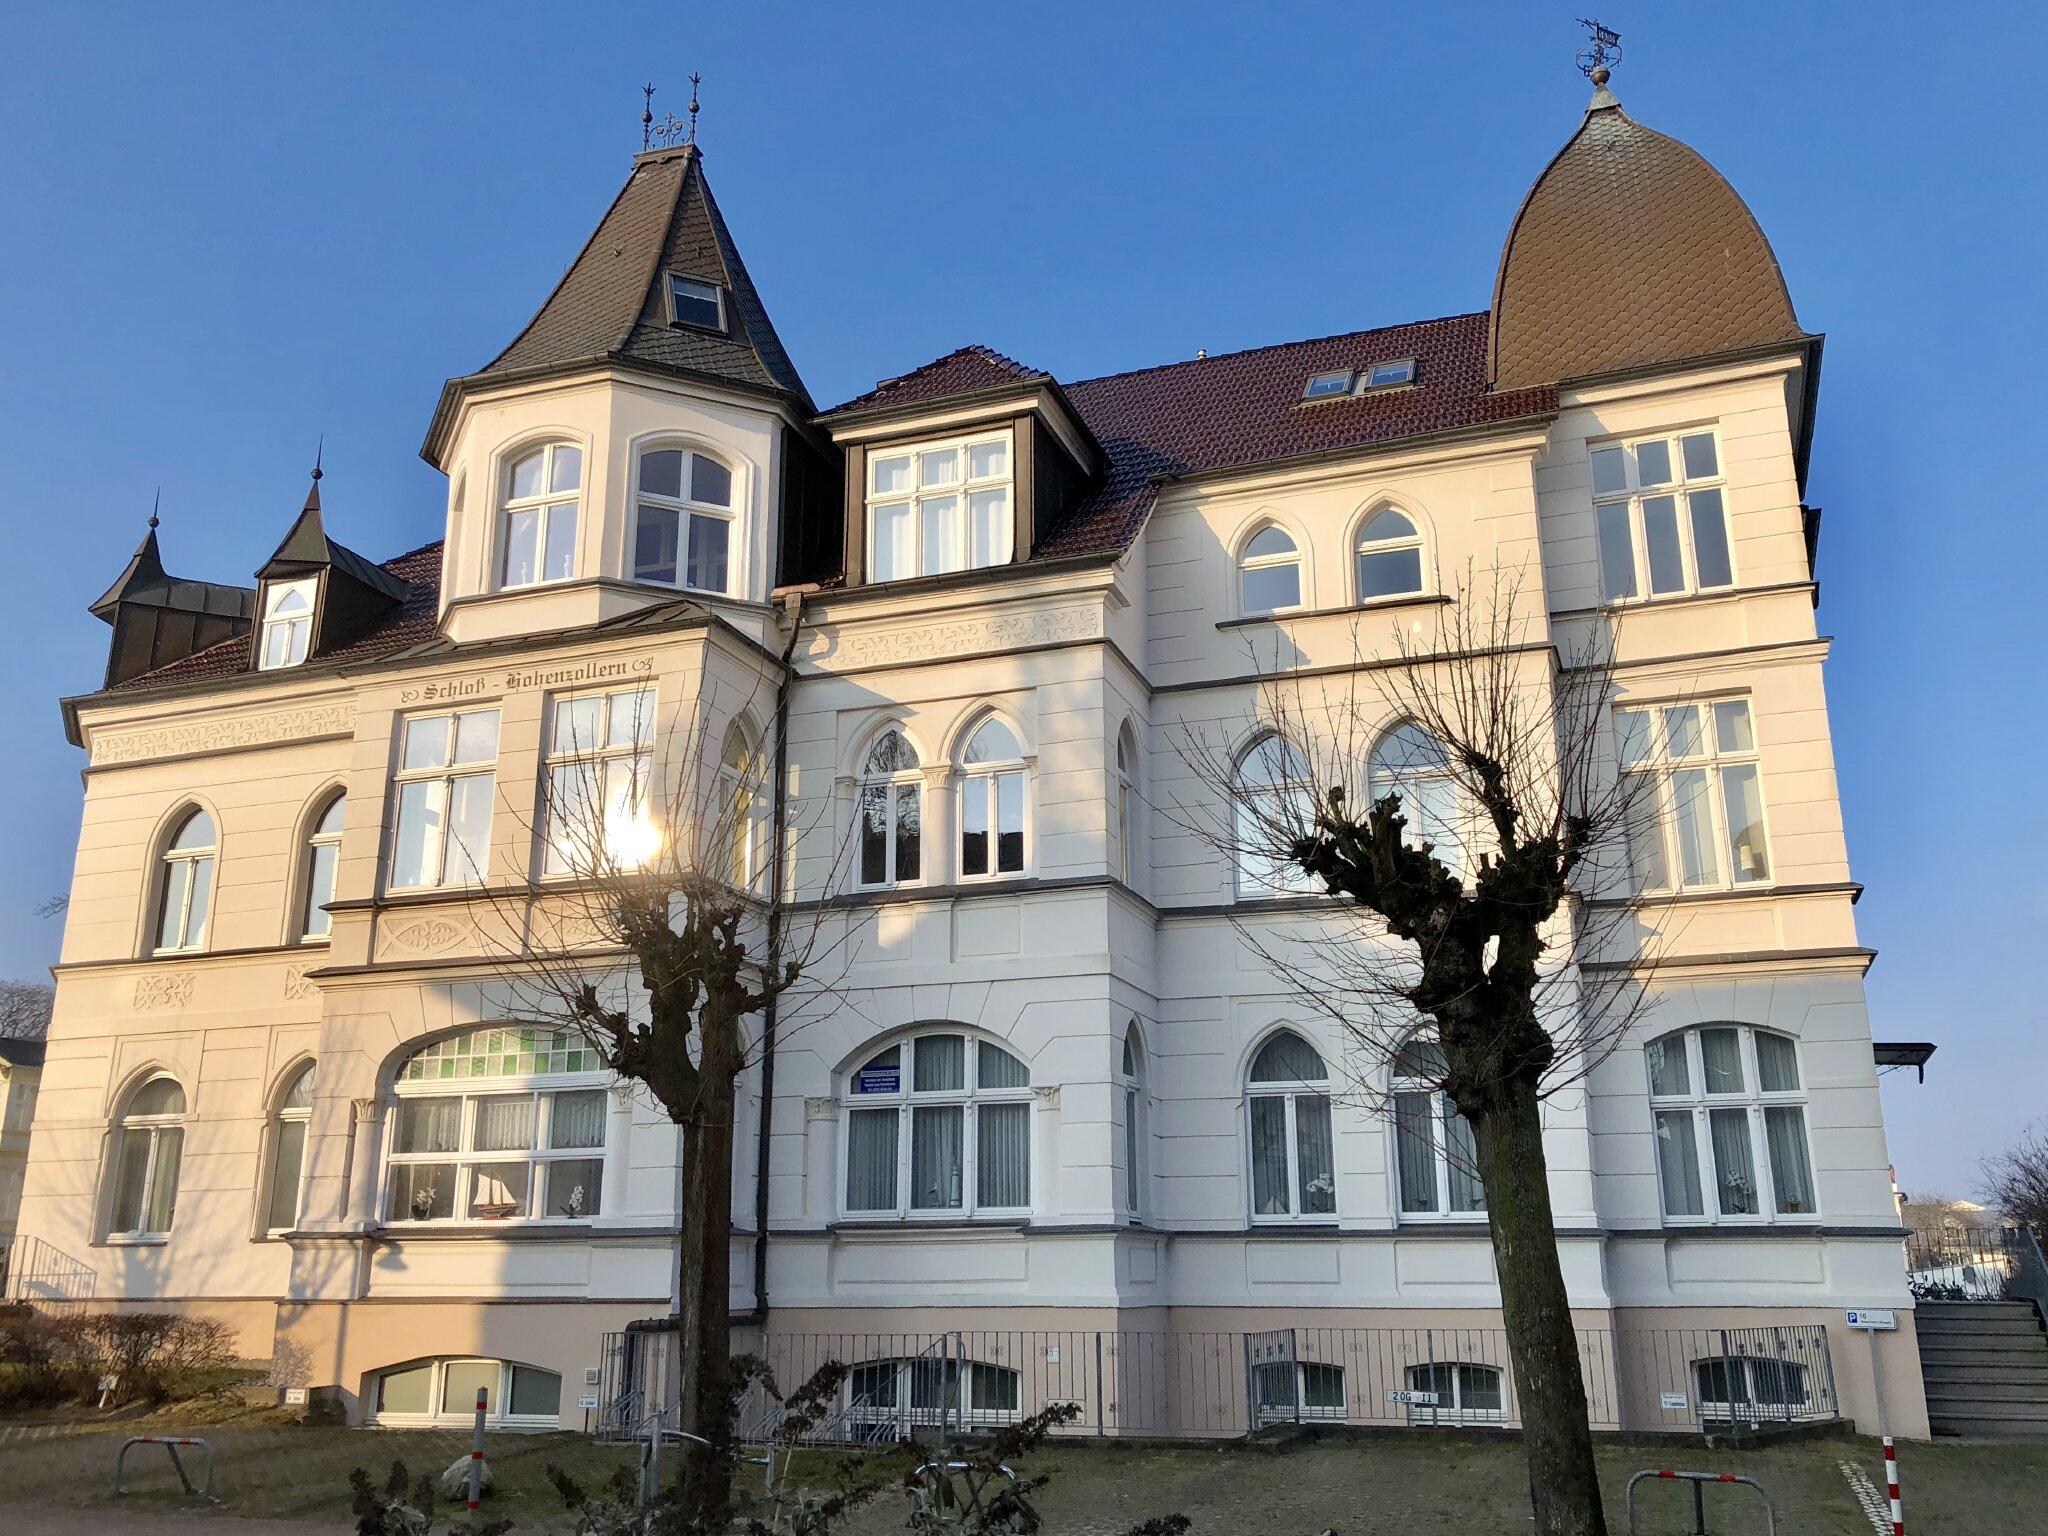 Haus Schloss Hohenzollern in Ahlbeck